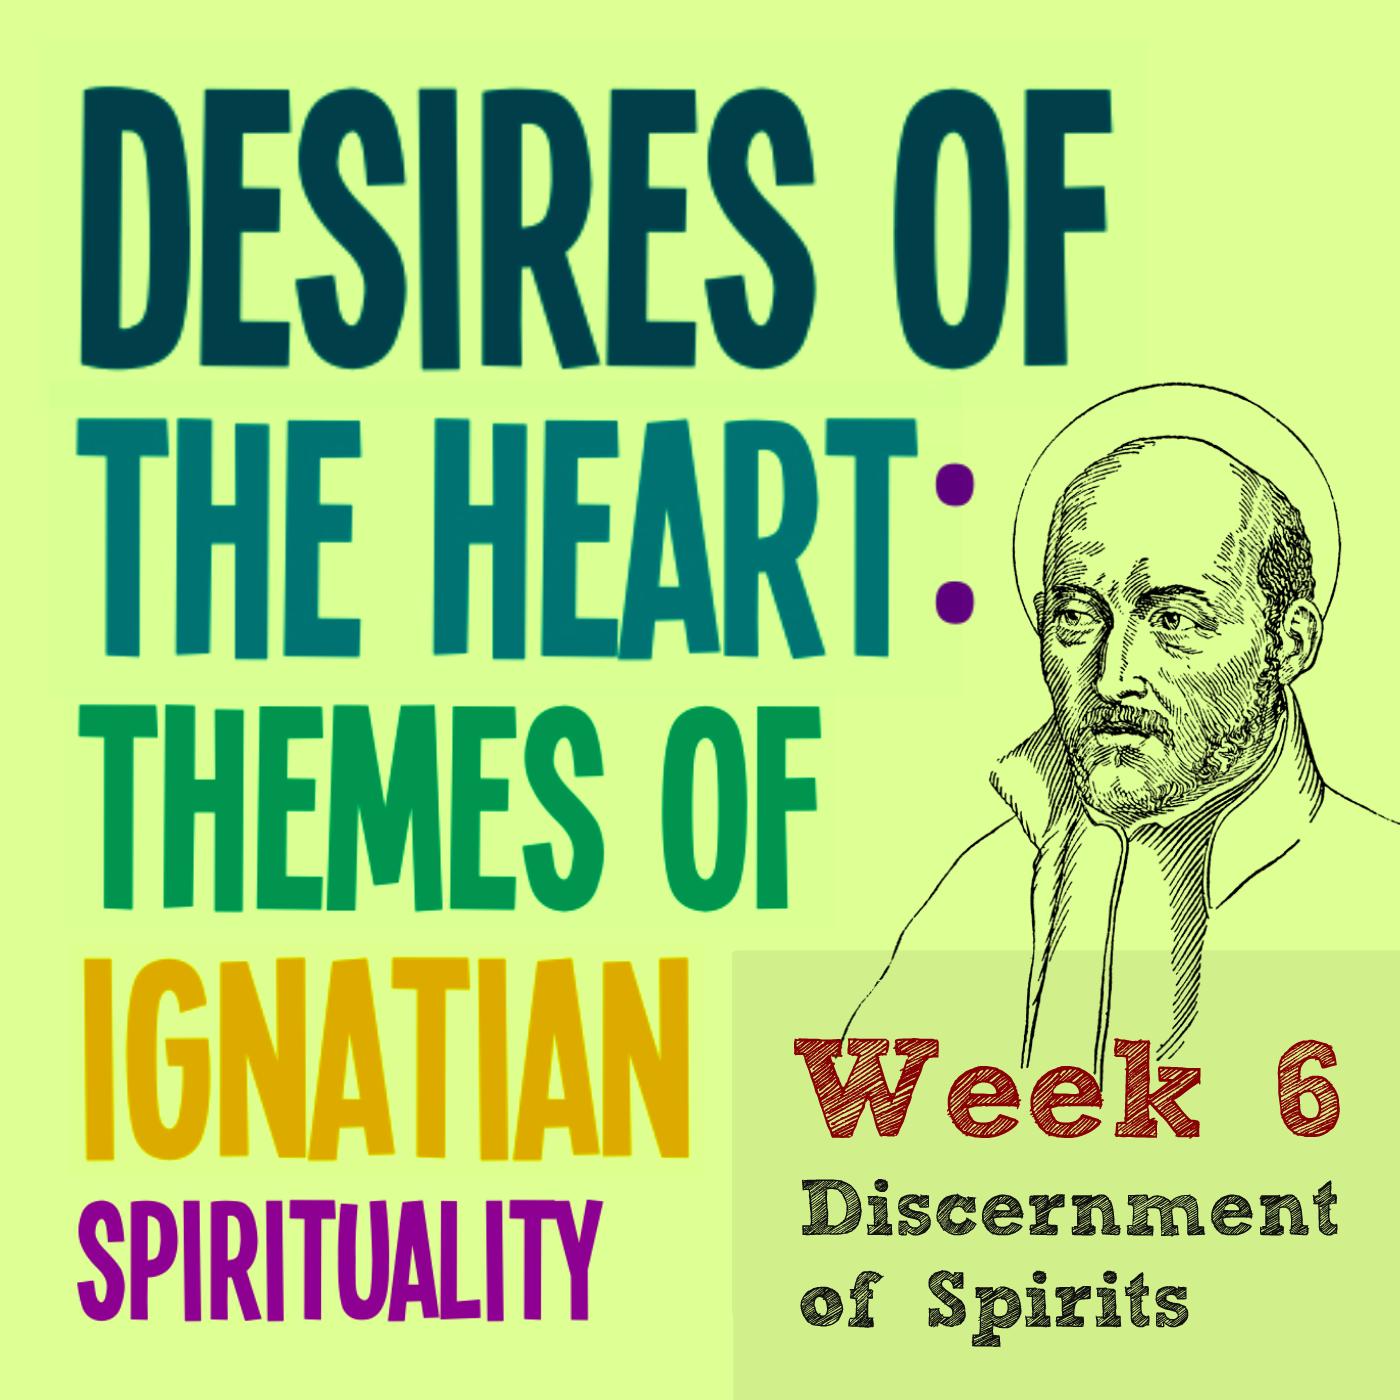 Discernment of Spirits – Week 6